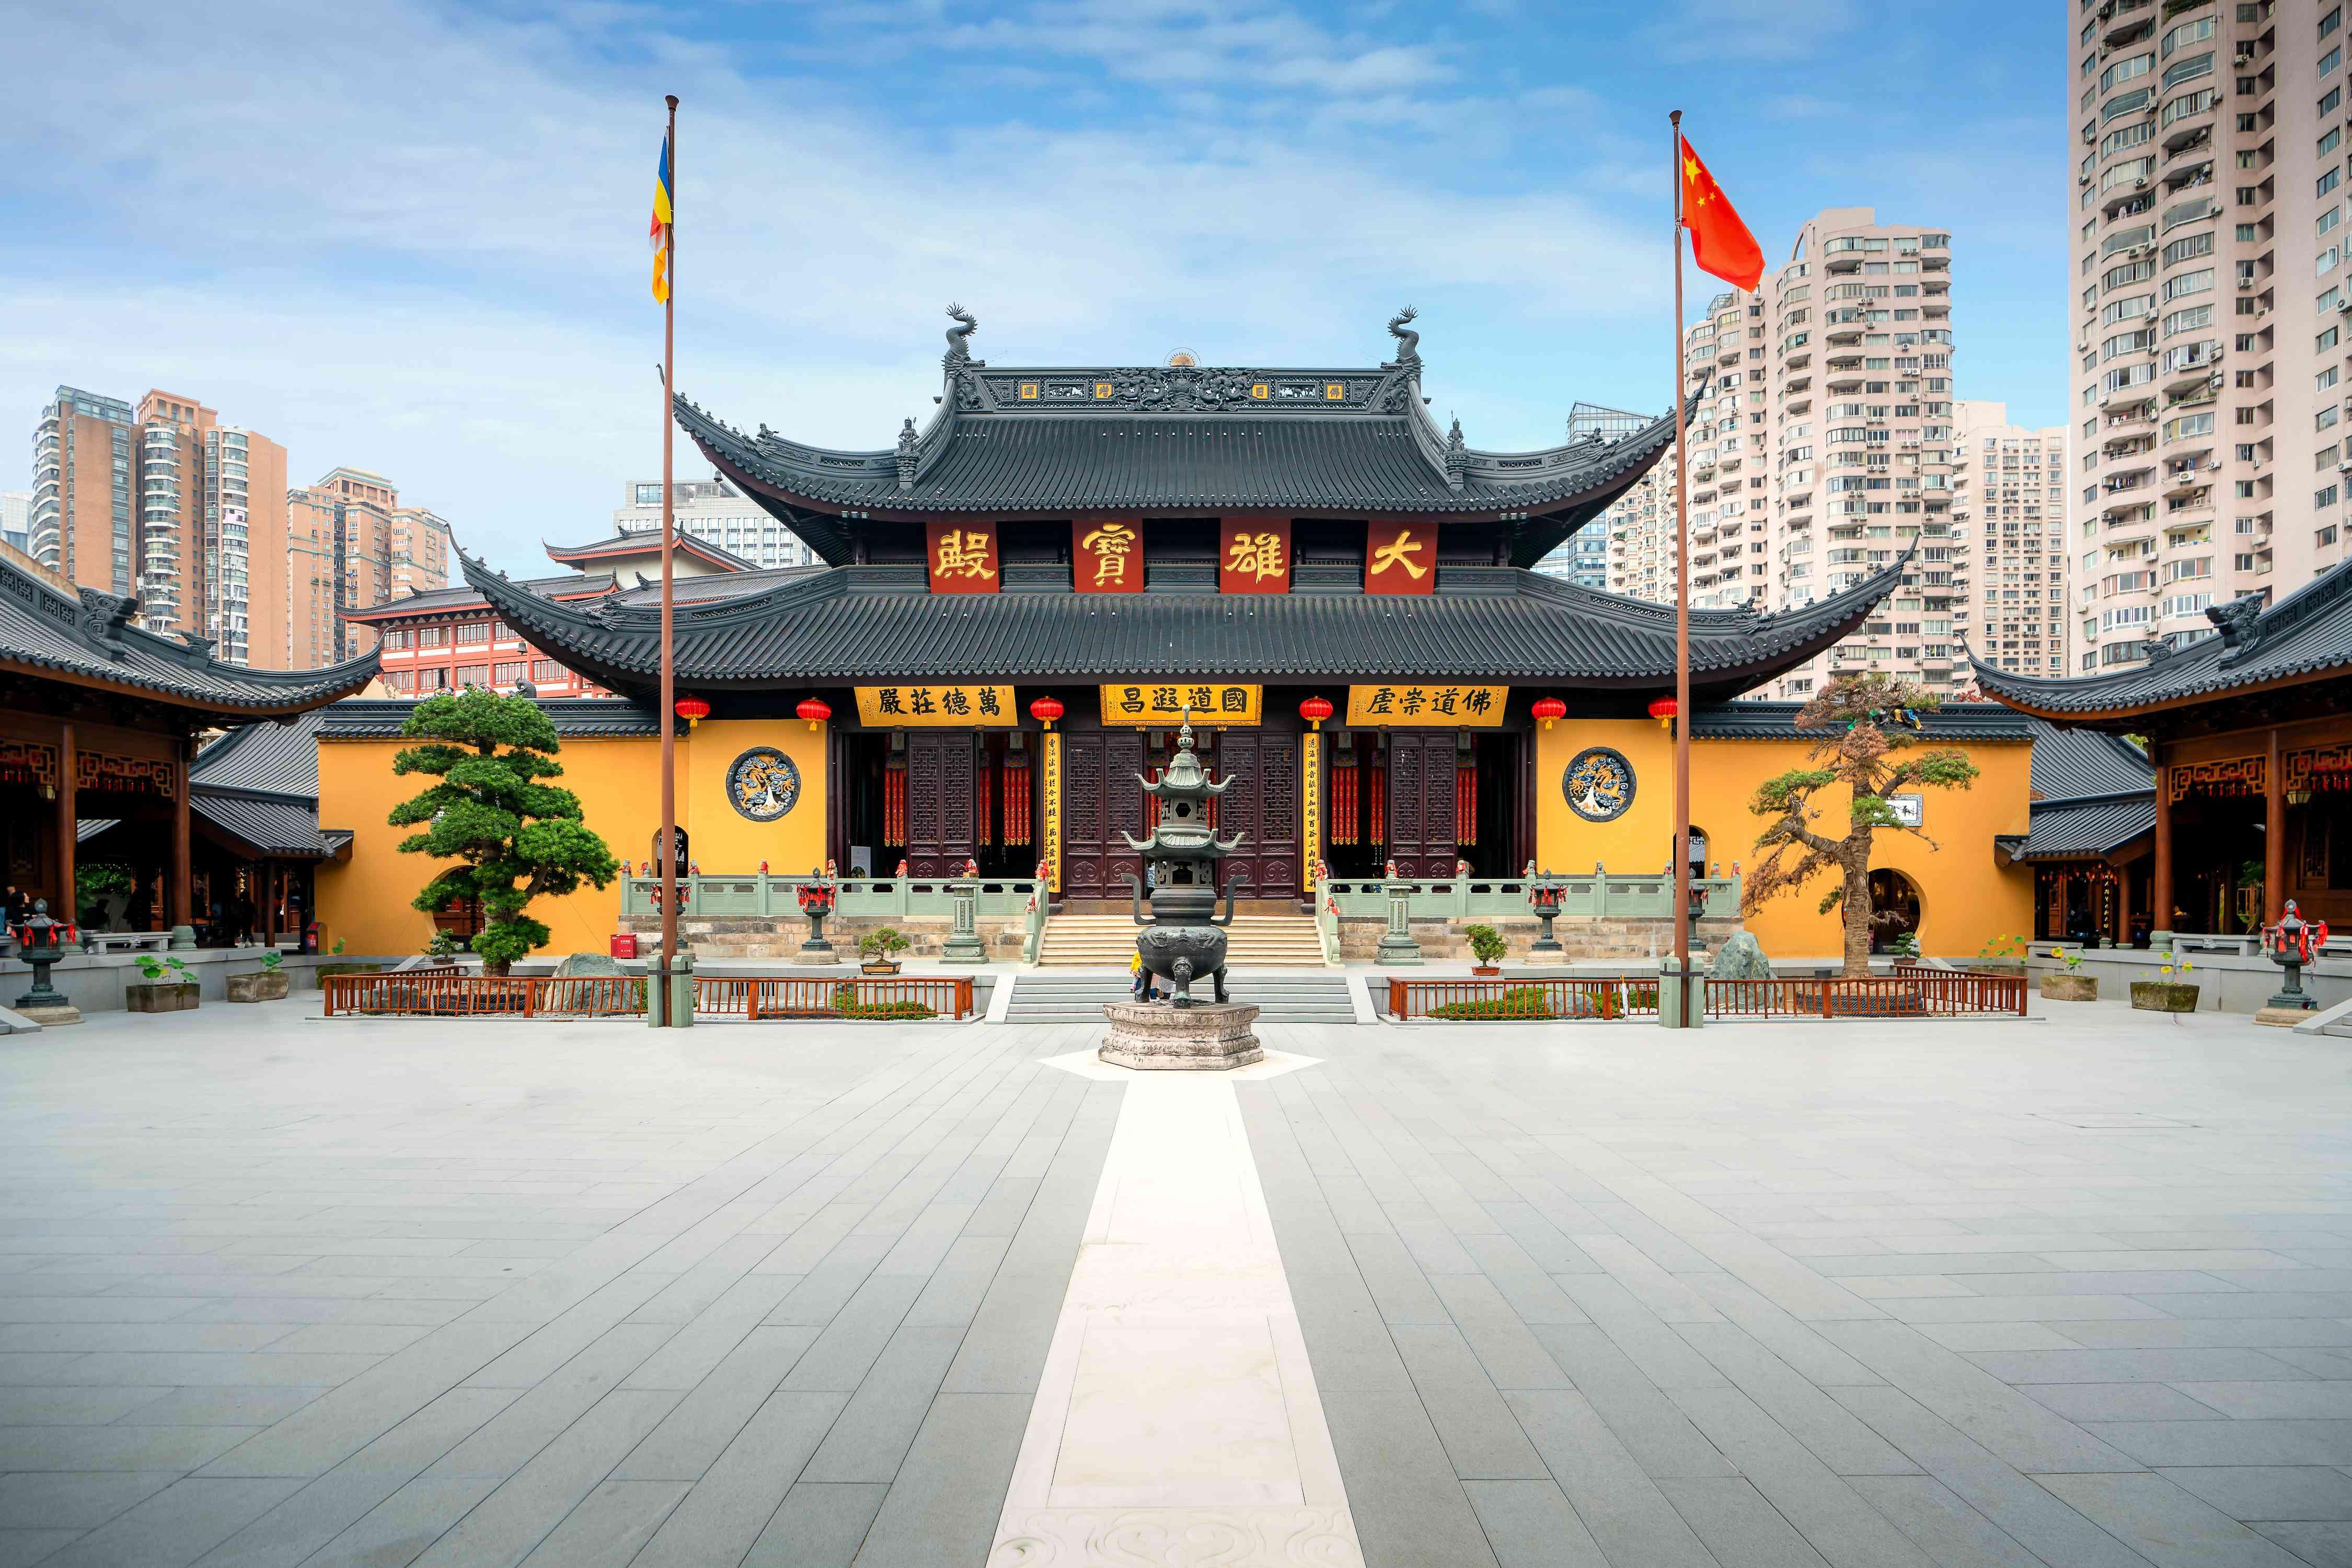 The Jade Temple in Shanghai